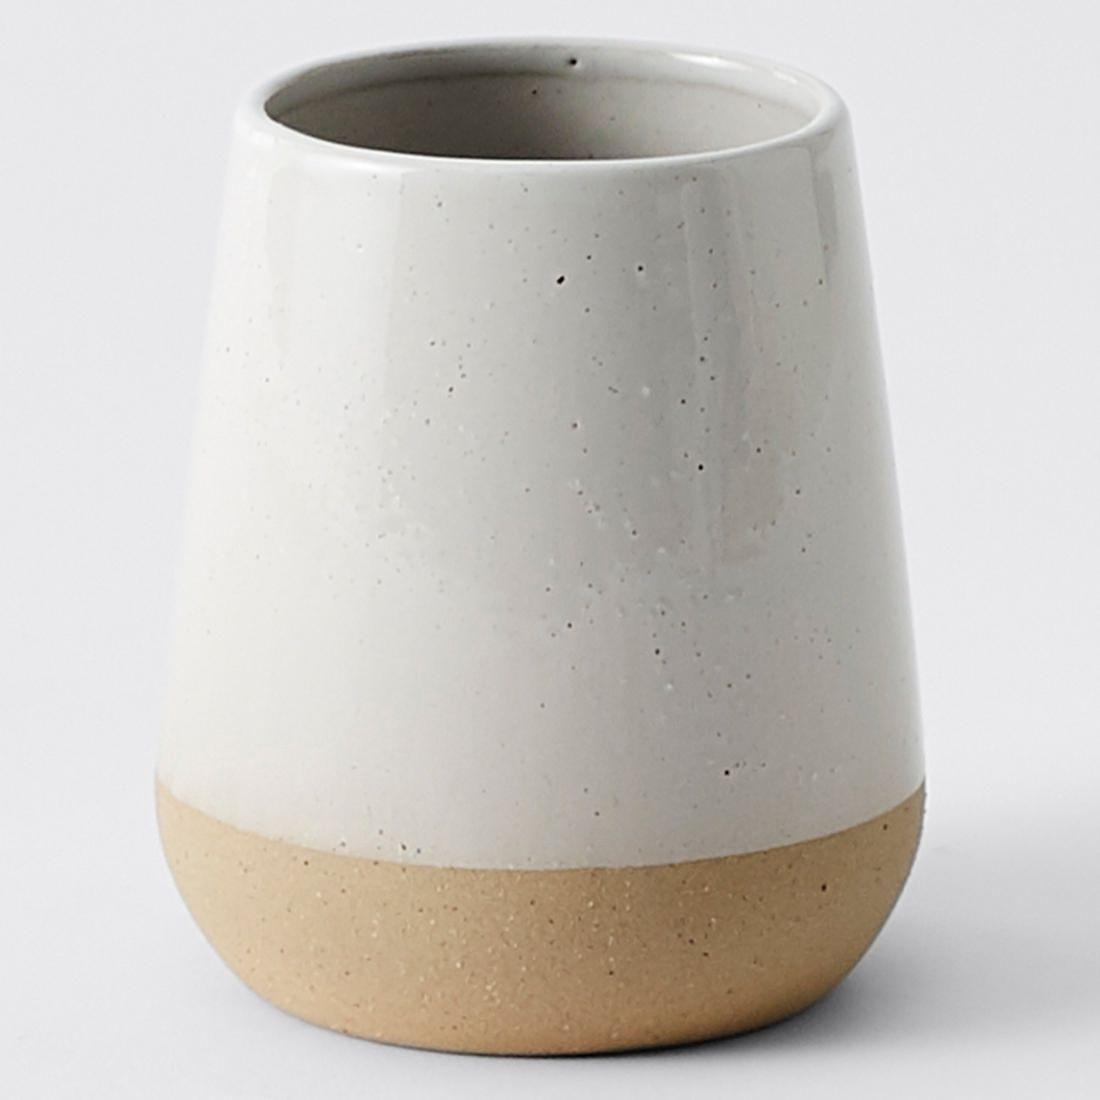 Dipped Glaze Ceramic Tumbler Ceramics, Tumbler, Glaze